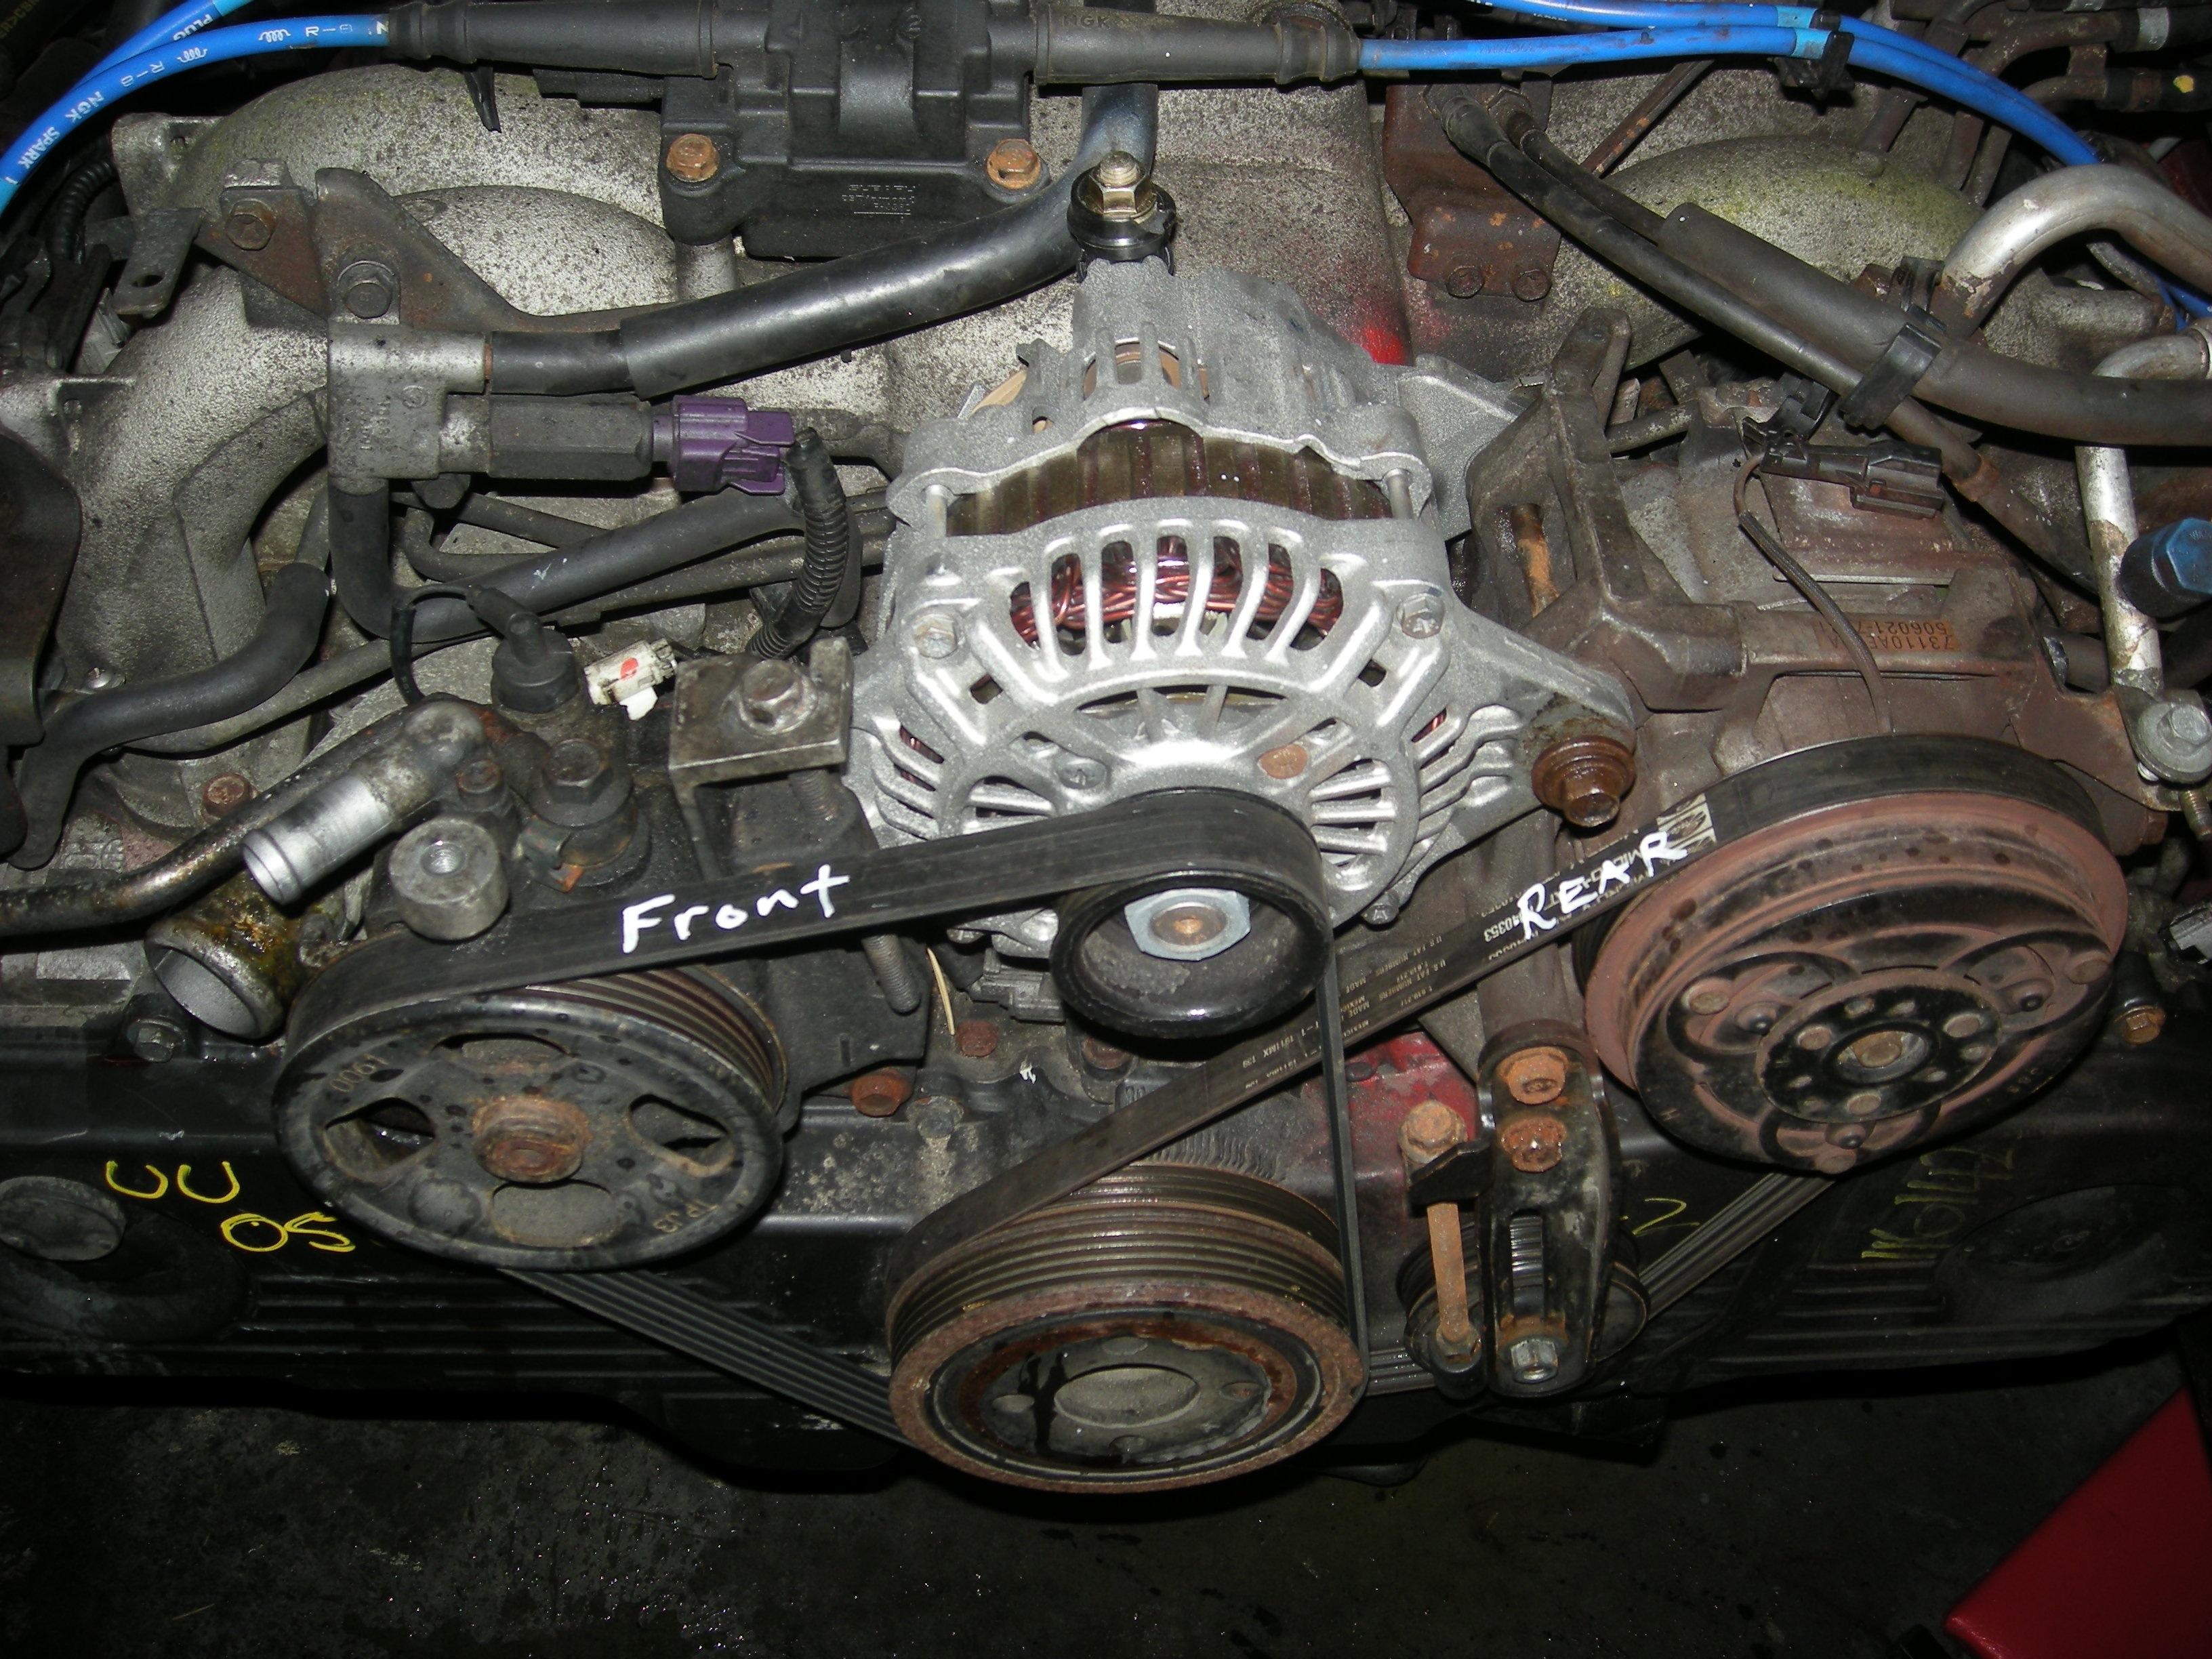 subaru boxer engine belt diagram wiring diagram source subaru 2 0 boxer engine diagram subaru boxer 4 engine fwd trans diagram [ 3264 x 2448 Pixel ]